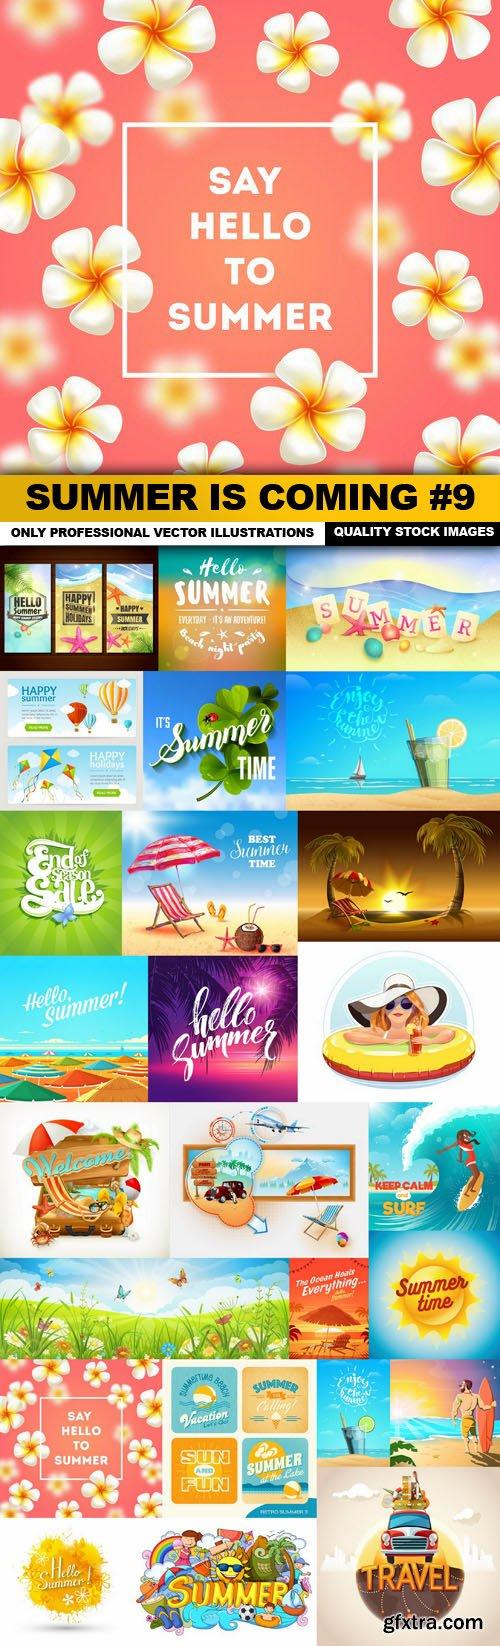 Summer Is Coming #9 - 25 Vector